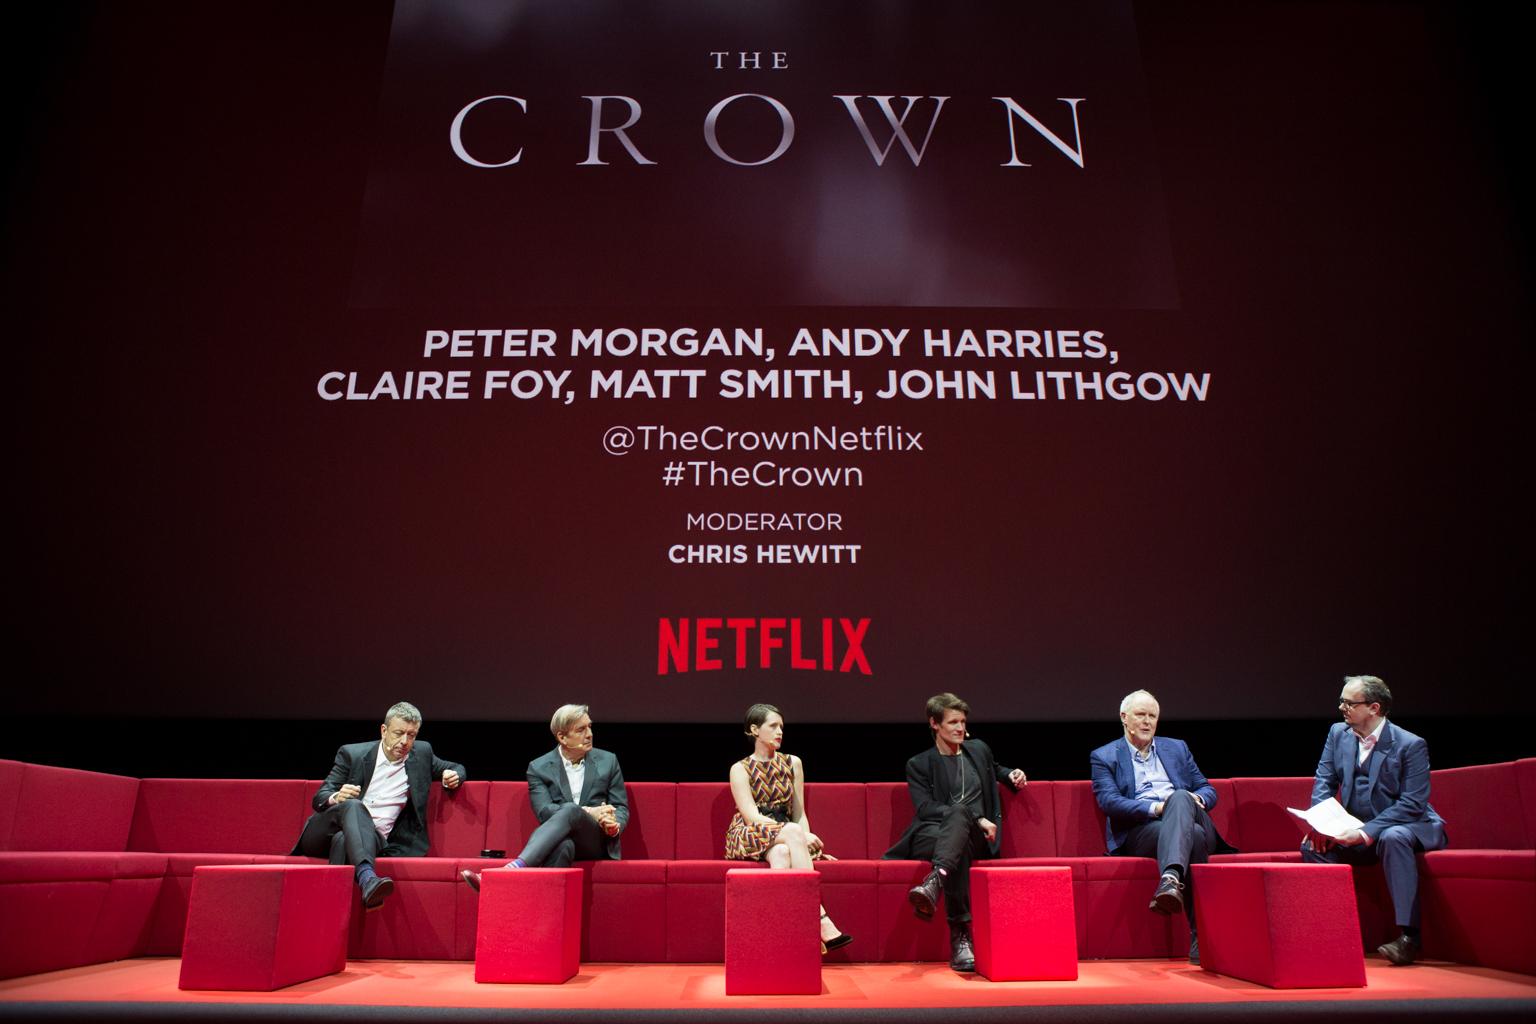 Netflix Event, Paris 11.04.2016 The Crown Panel (L-R) Peter Morgan, Andy Harries, Claire Foy, Matt Smith, Jon Lithgow, moderator Chris Hewitt